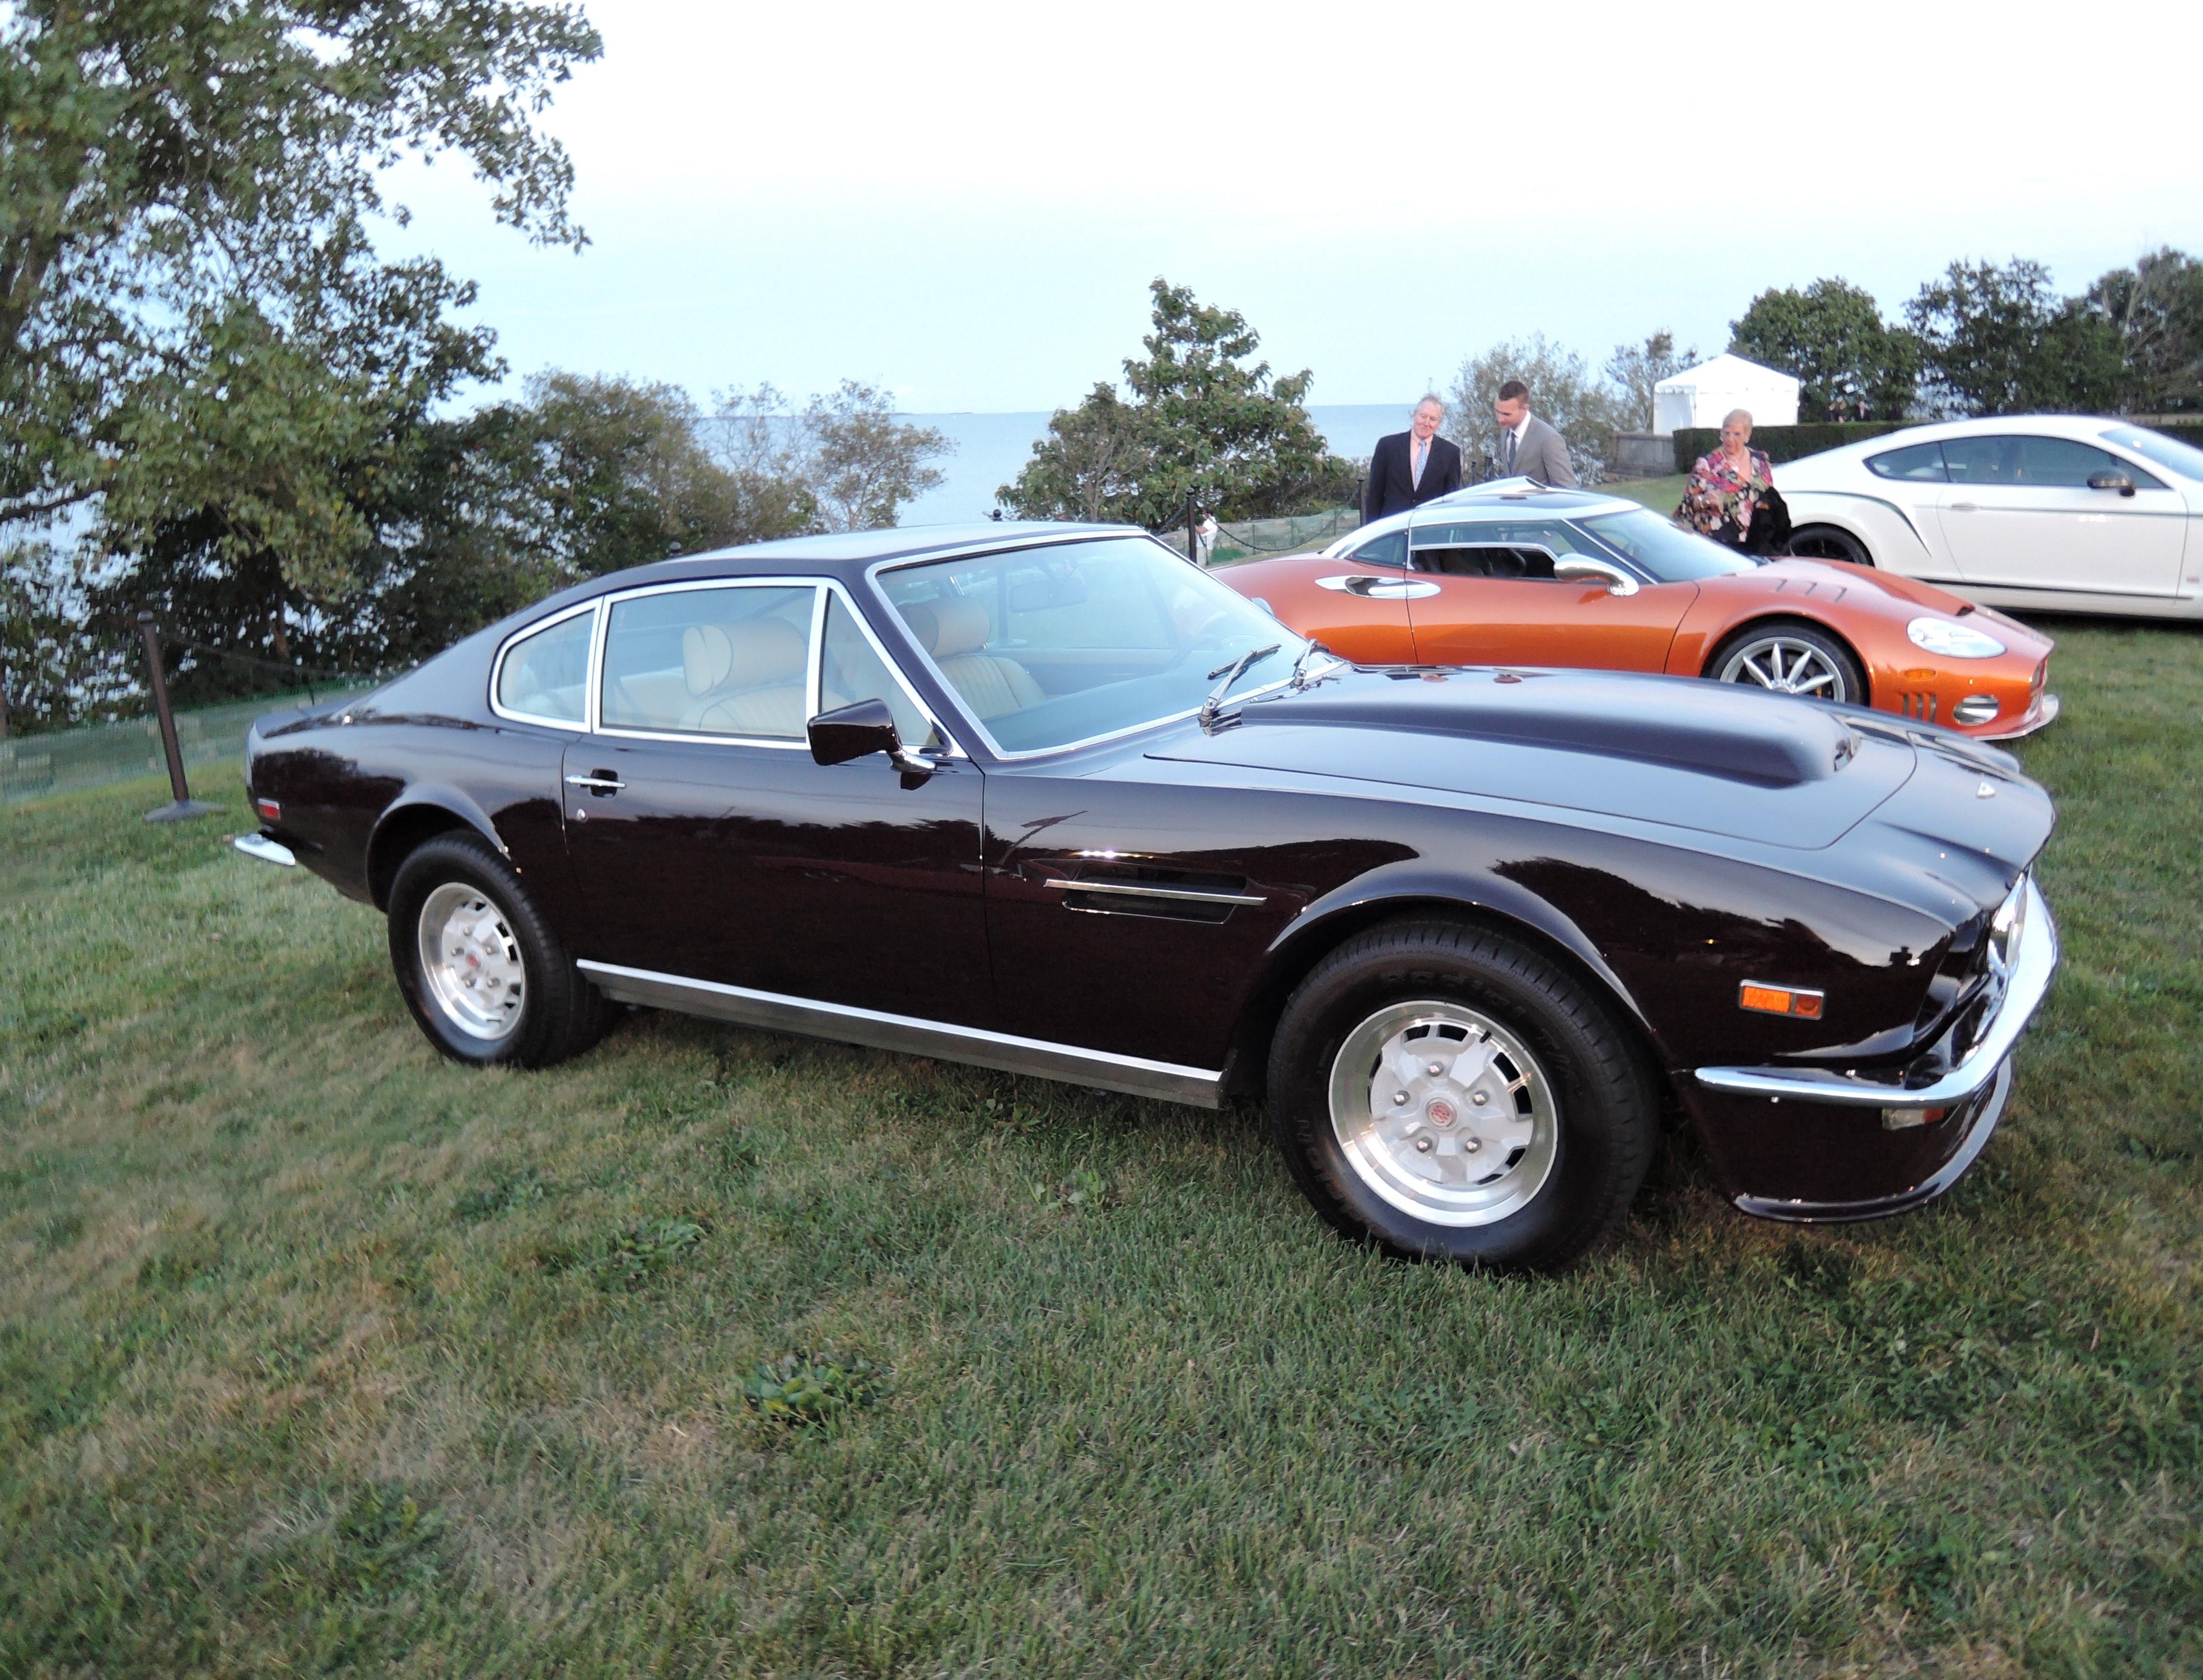 black 1978 Aston Martin V8 'Canadian Vantage' - Audrain Auto Museum Gala 2017